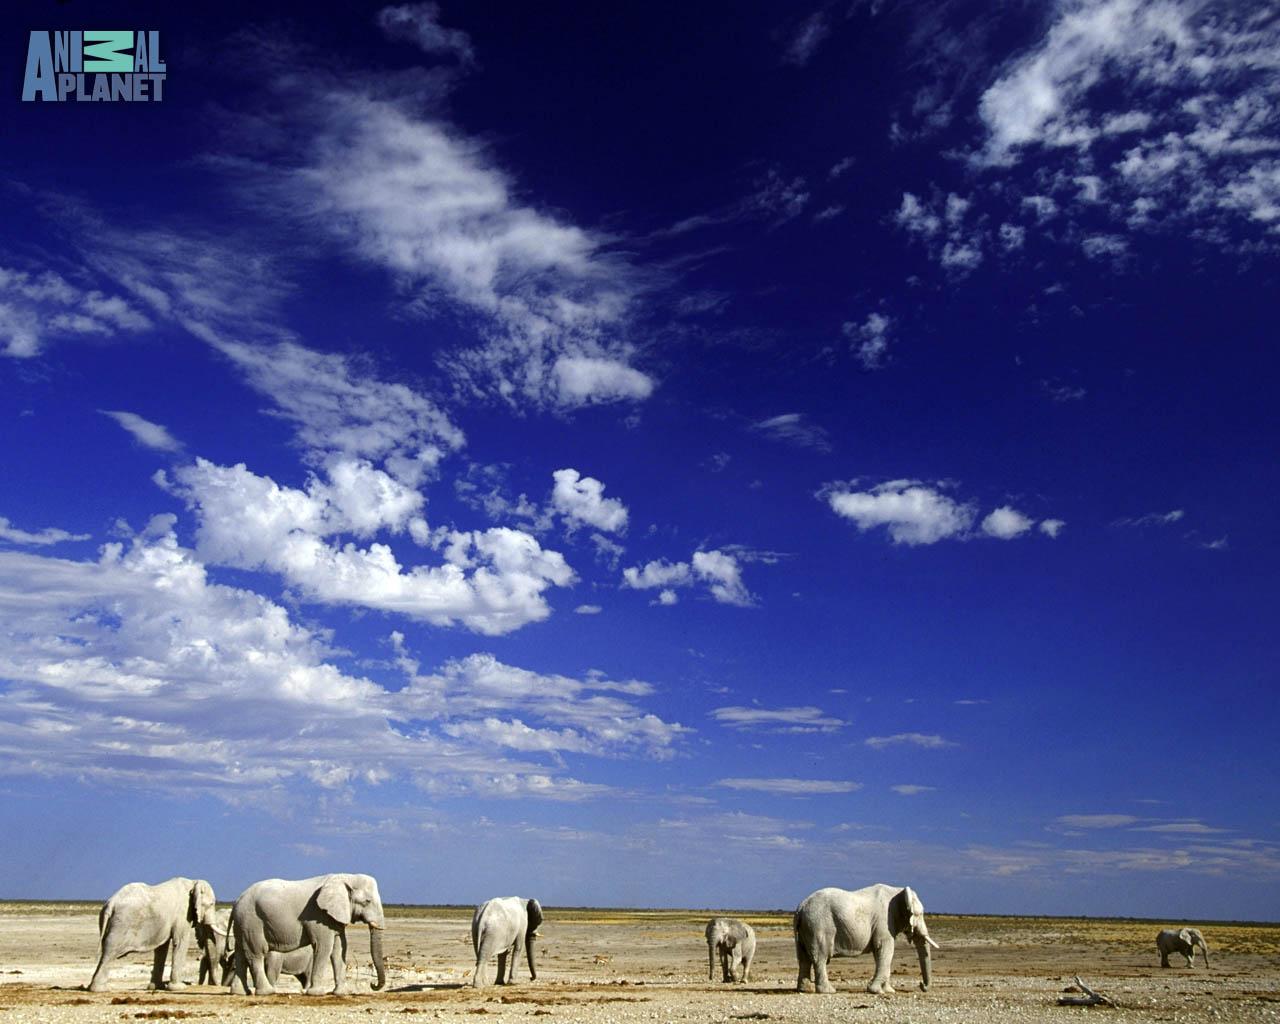 Animal Planet Wallpaper Download   elephants desert 1280x1024